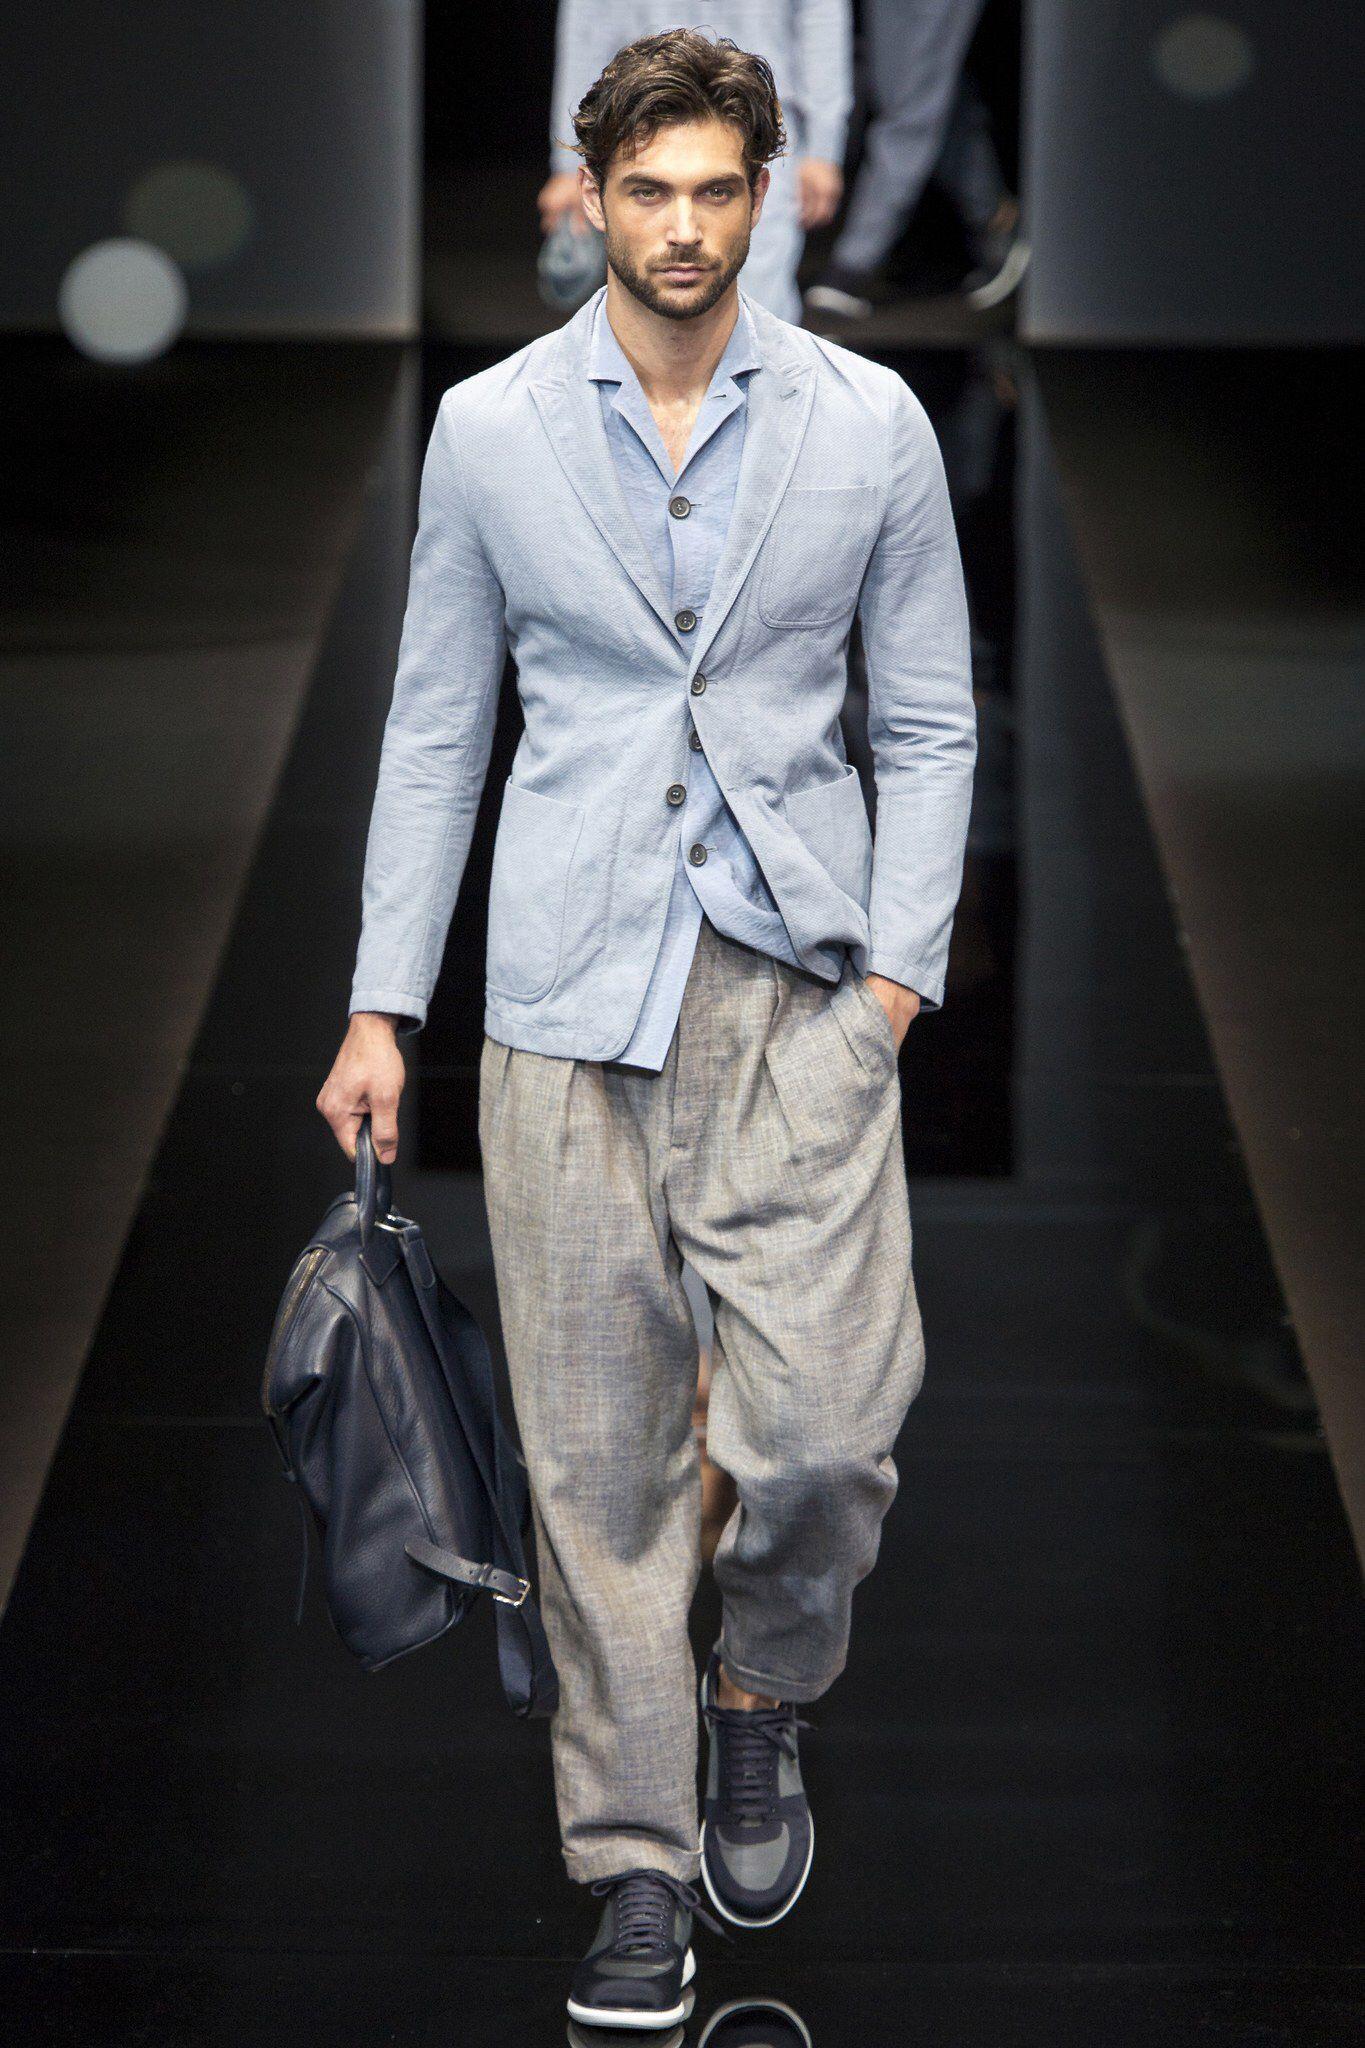 Armani giorgio clothes for men forecasting dress in summer in 2019